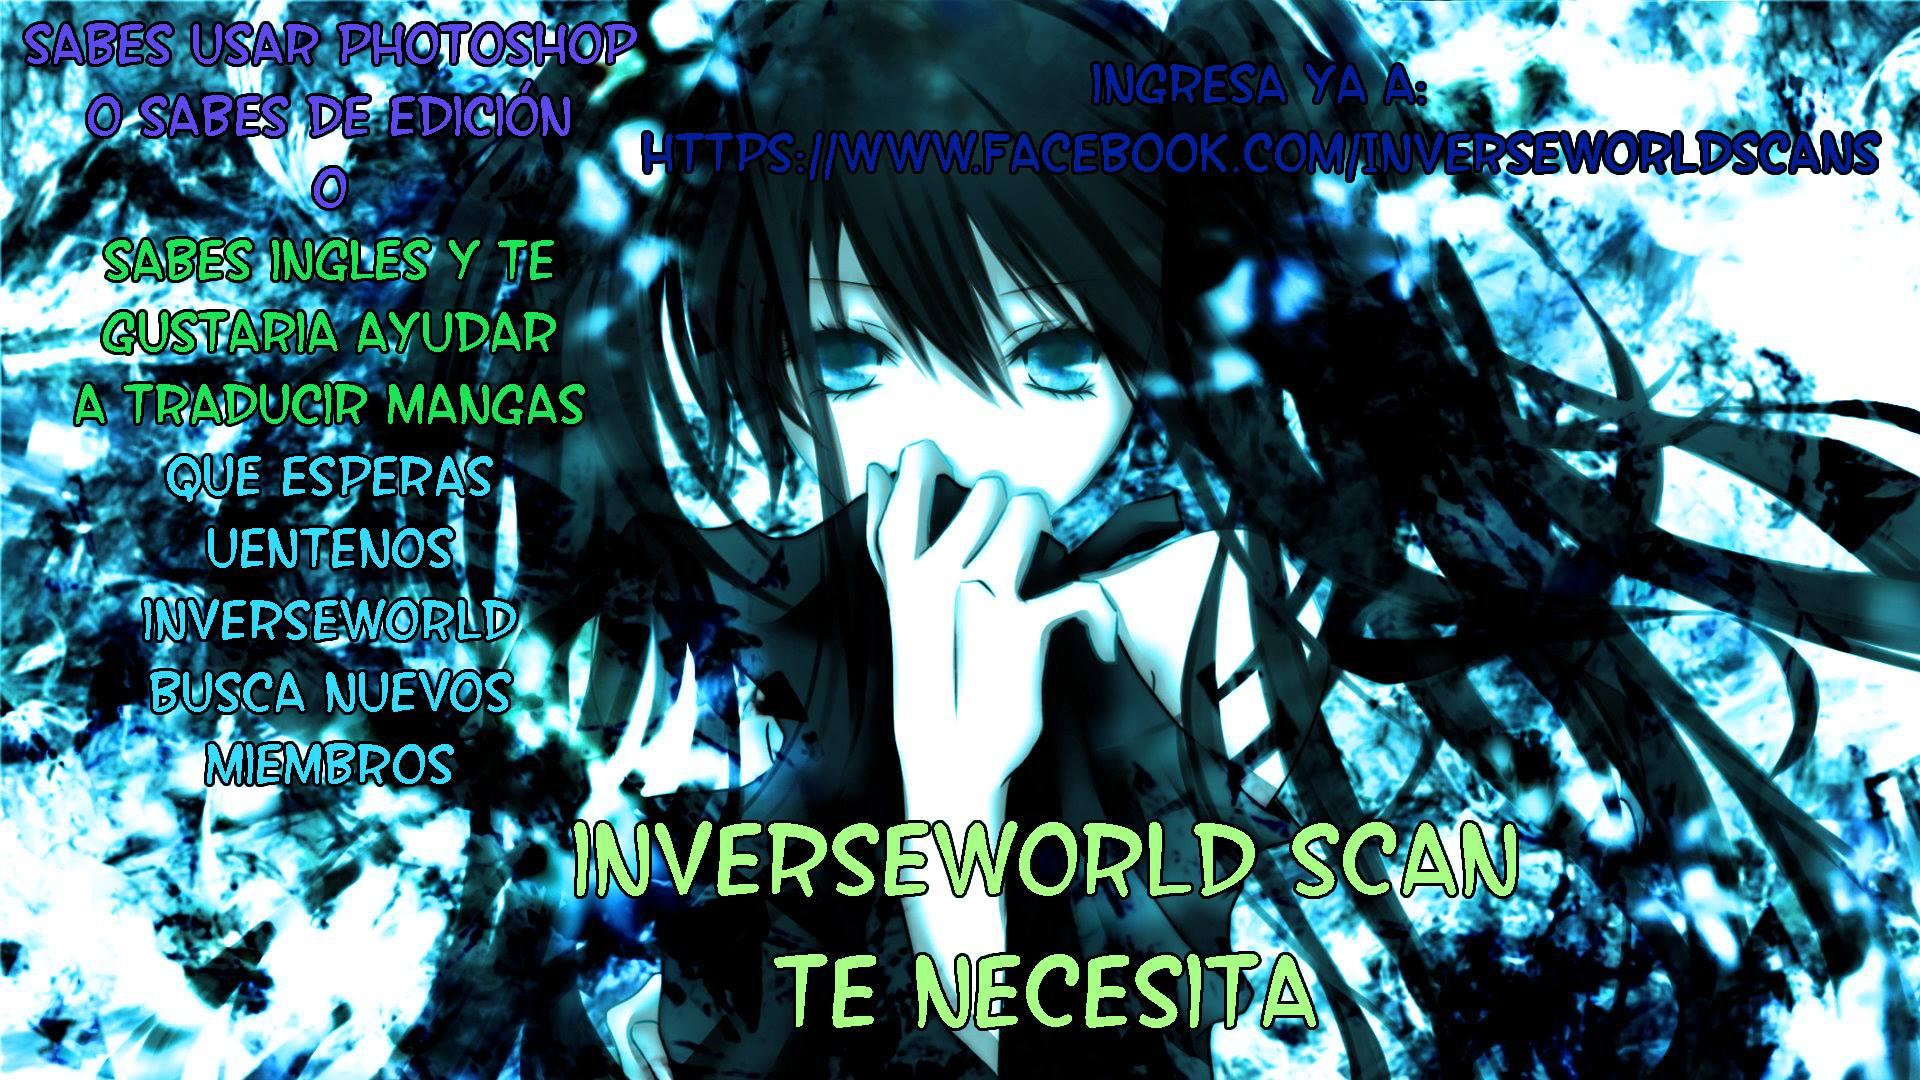 http://c5.ninemanga.com/es_manga/18/16210/415324/708cbabe9ec56bb5abe6a92d810e7ca6.jpg Page 2